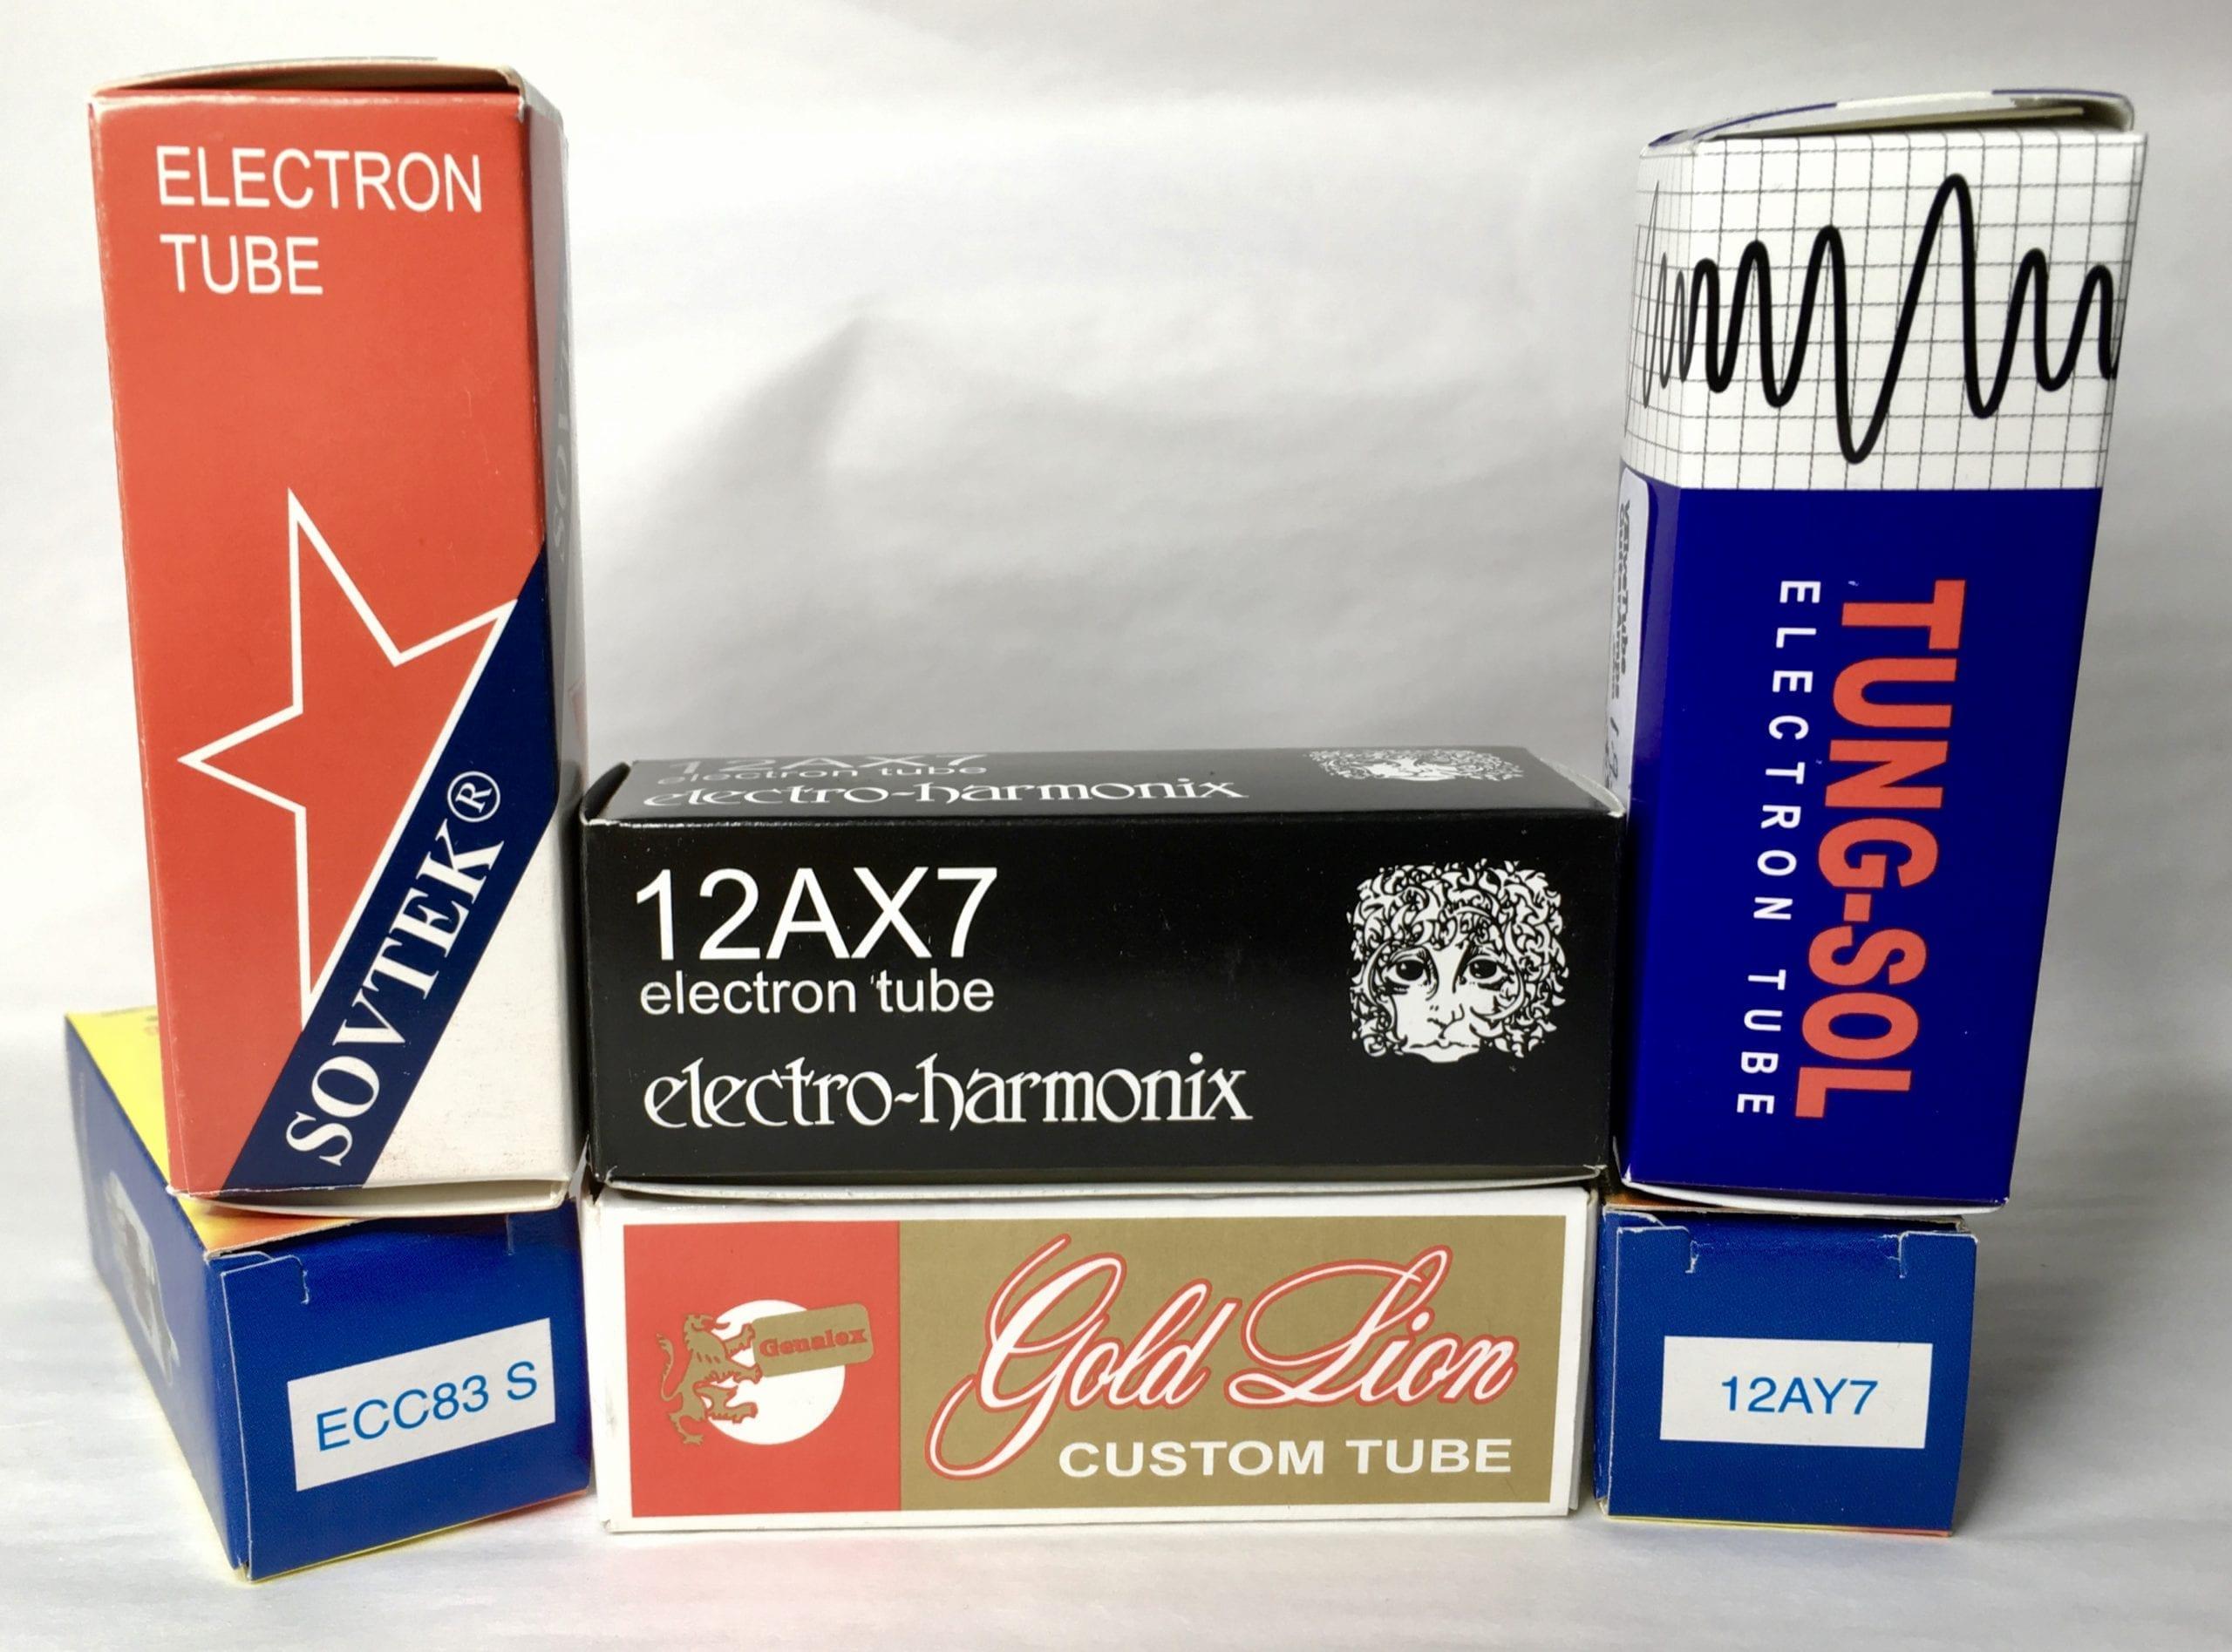 Sovtek Tung Sol Electro Harmonix Genalex JJ Electronic valves